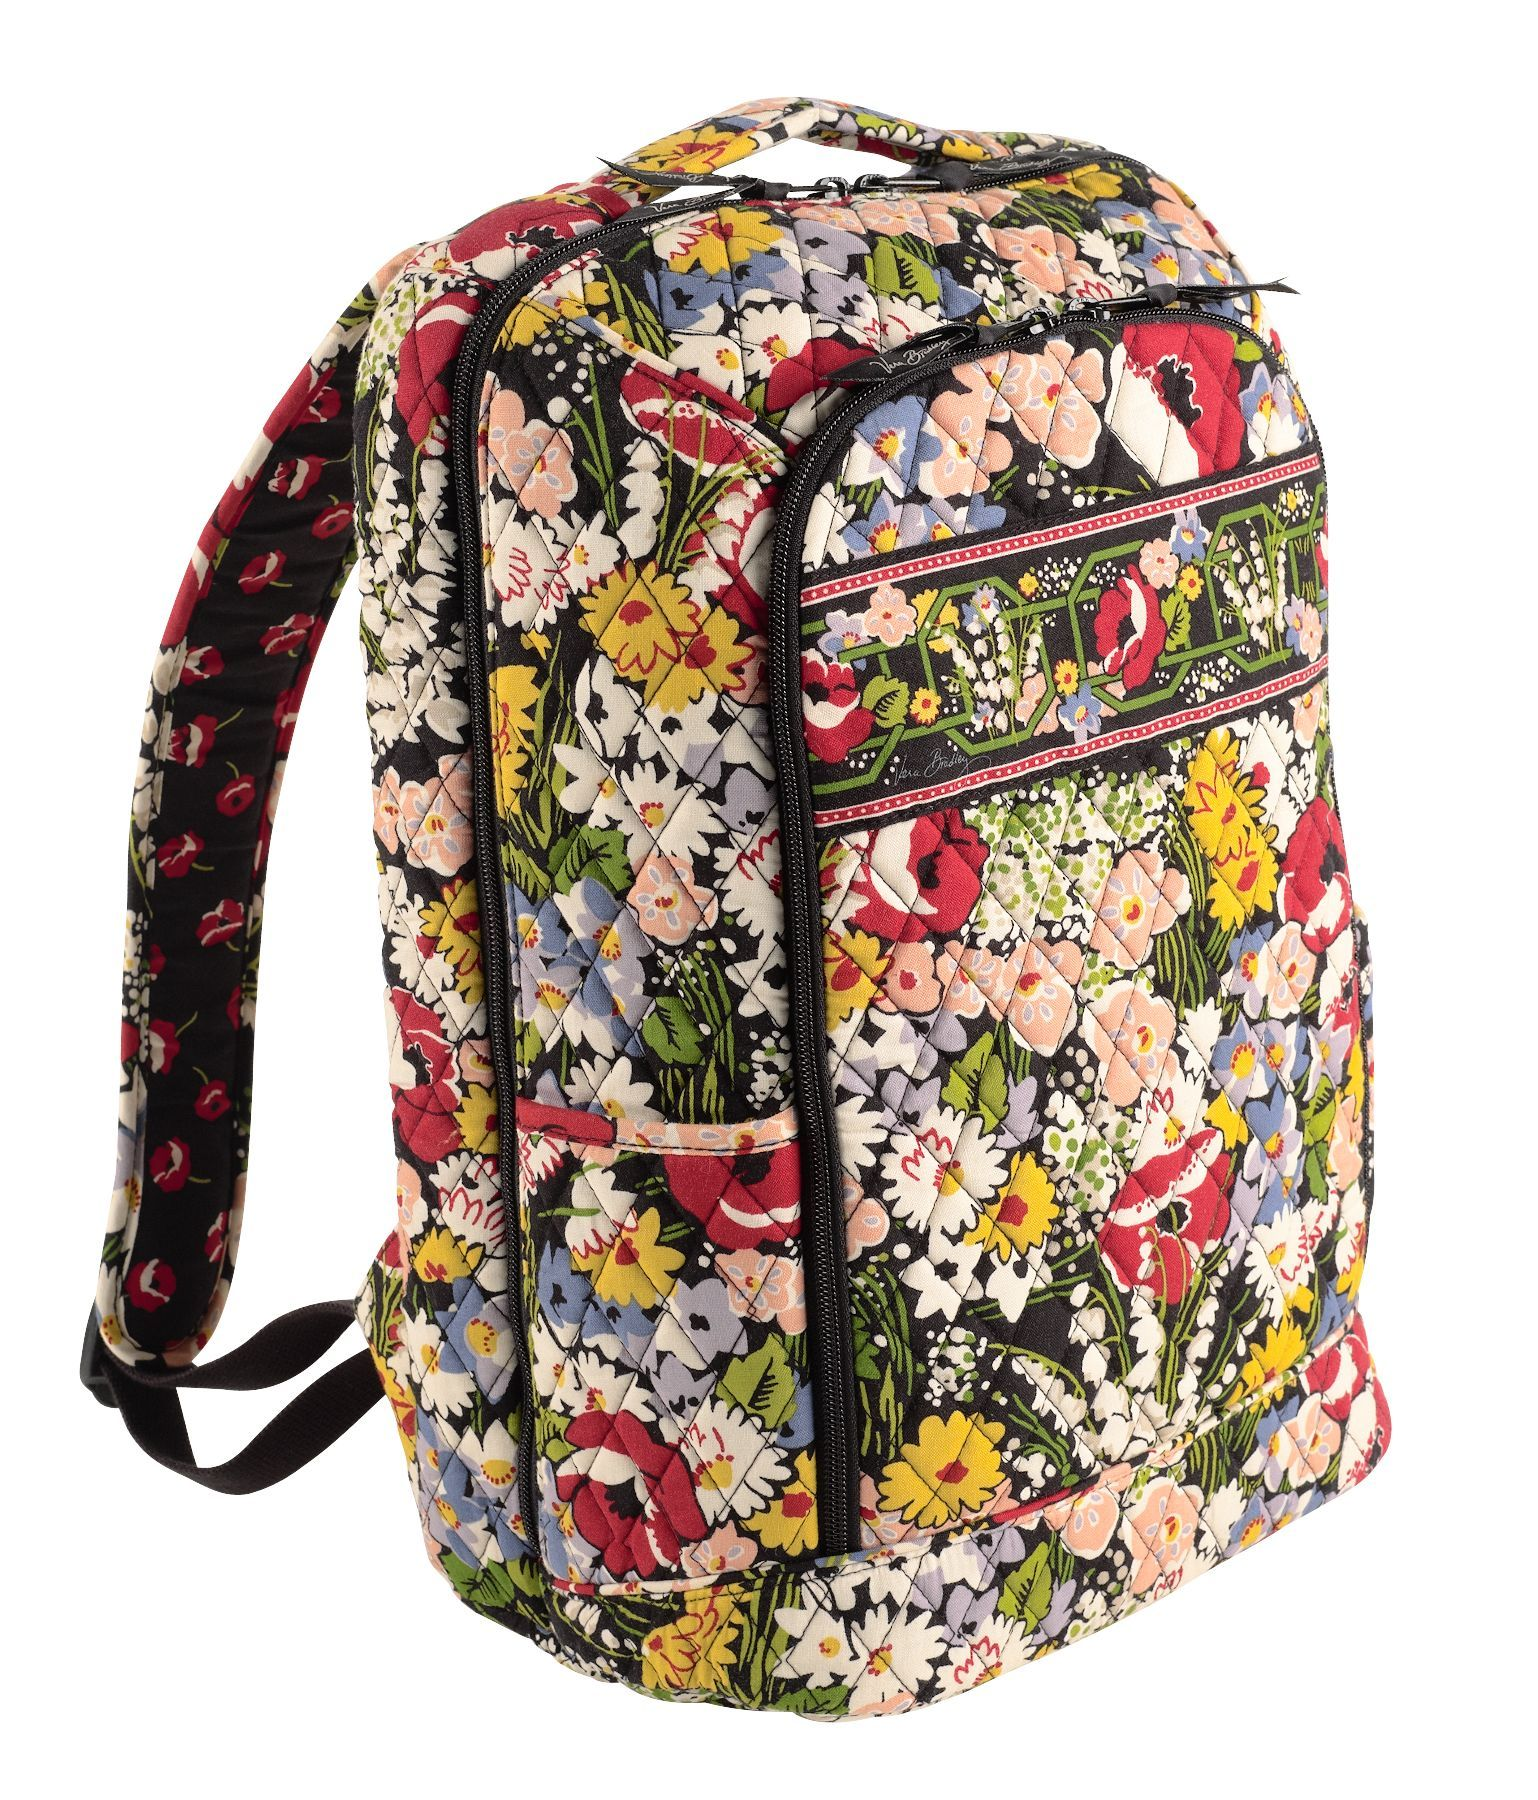 57a59c412024 Vera Bradley Laptop Backpack in Poppy Fields. My other design